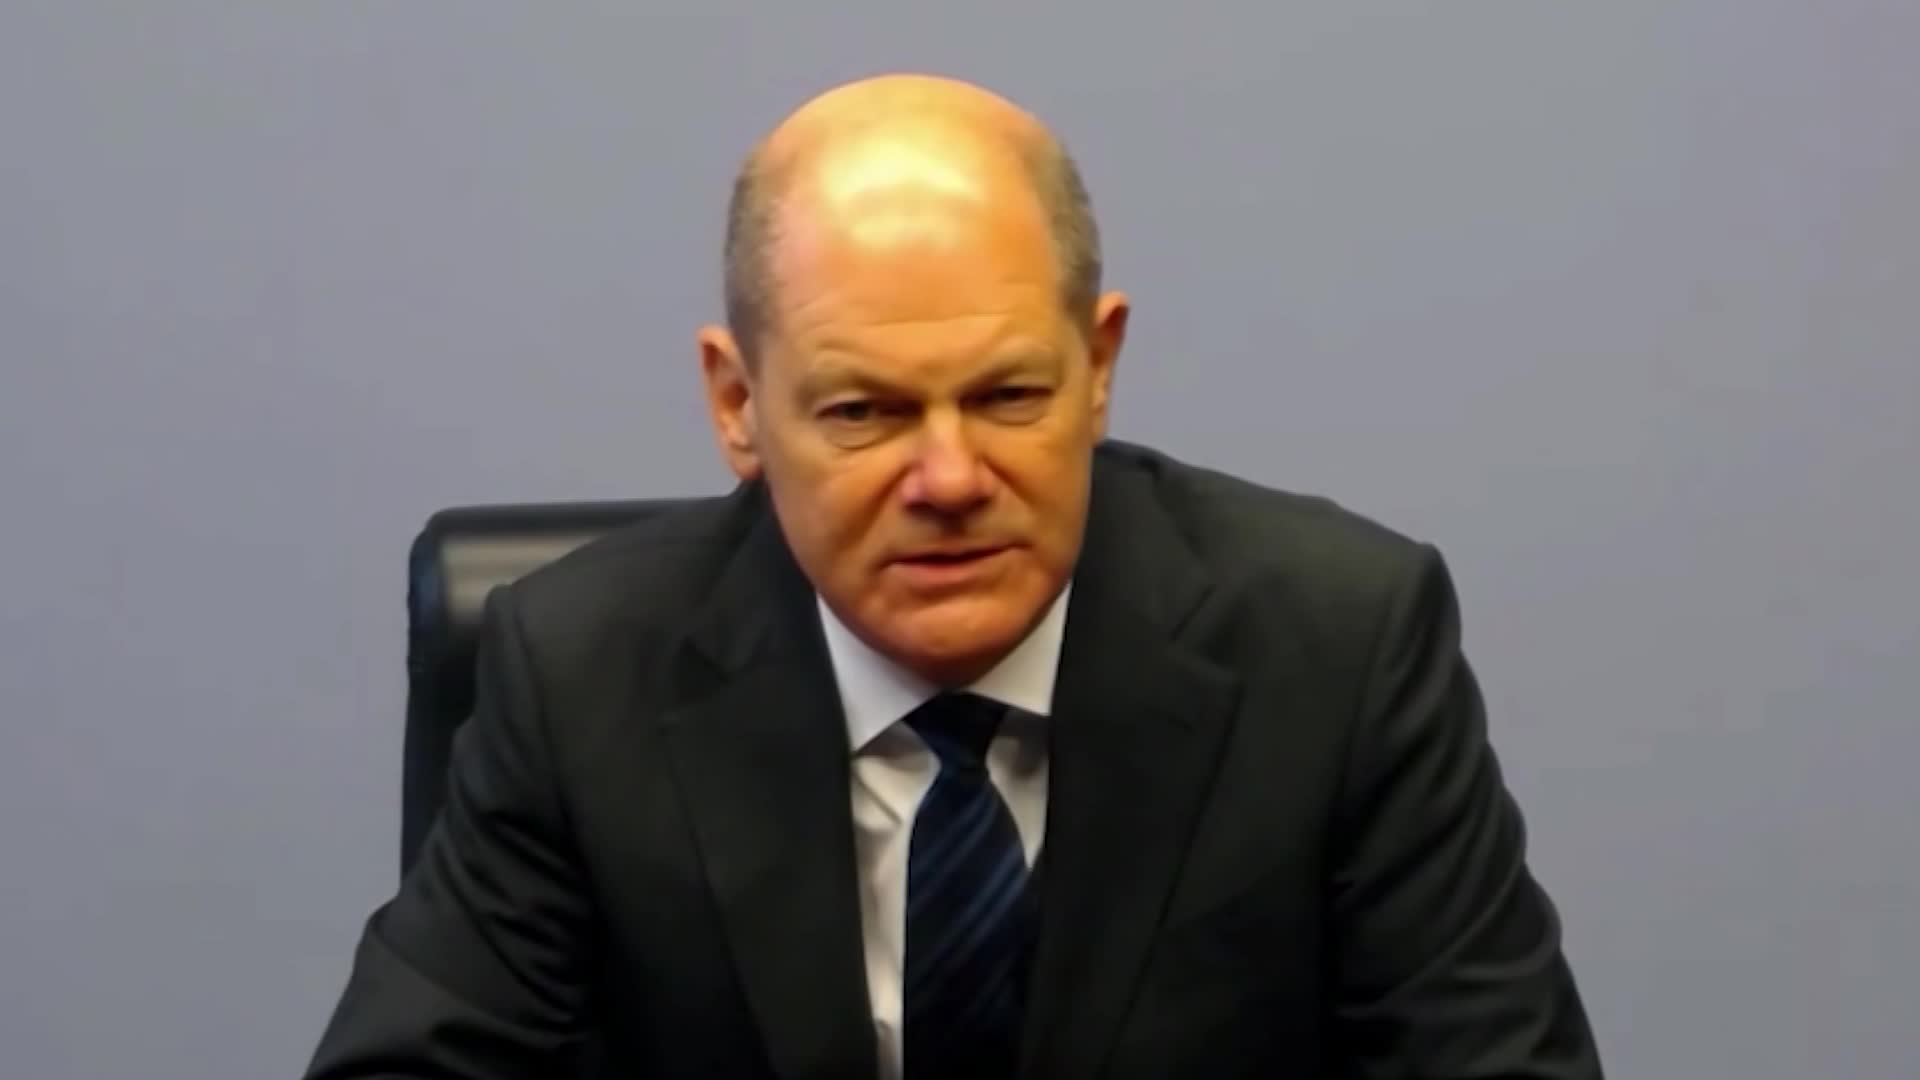 German Finance MinisterOlaf Scholz